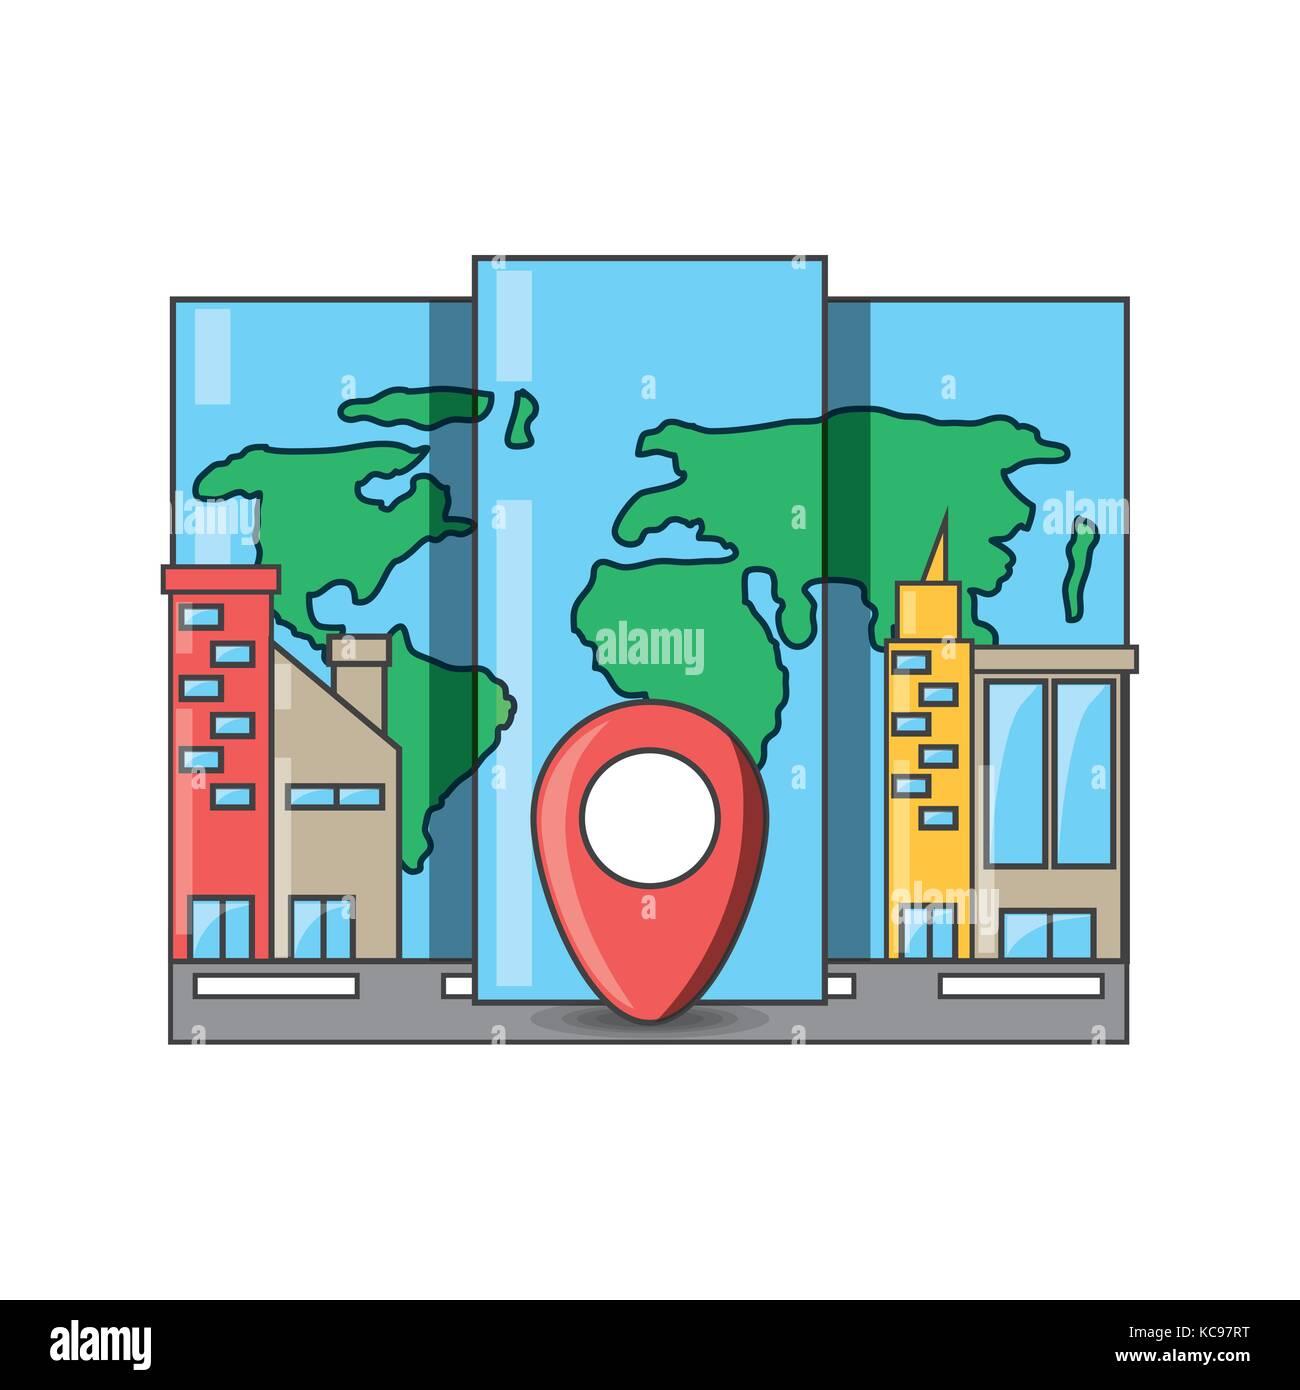 Travel and navigation design - Stock Image